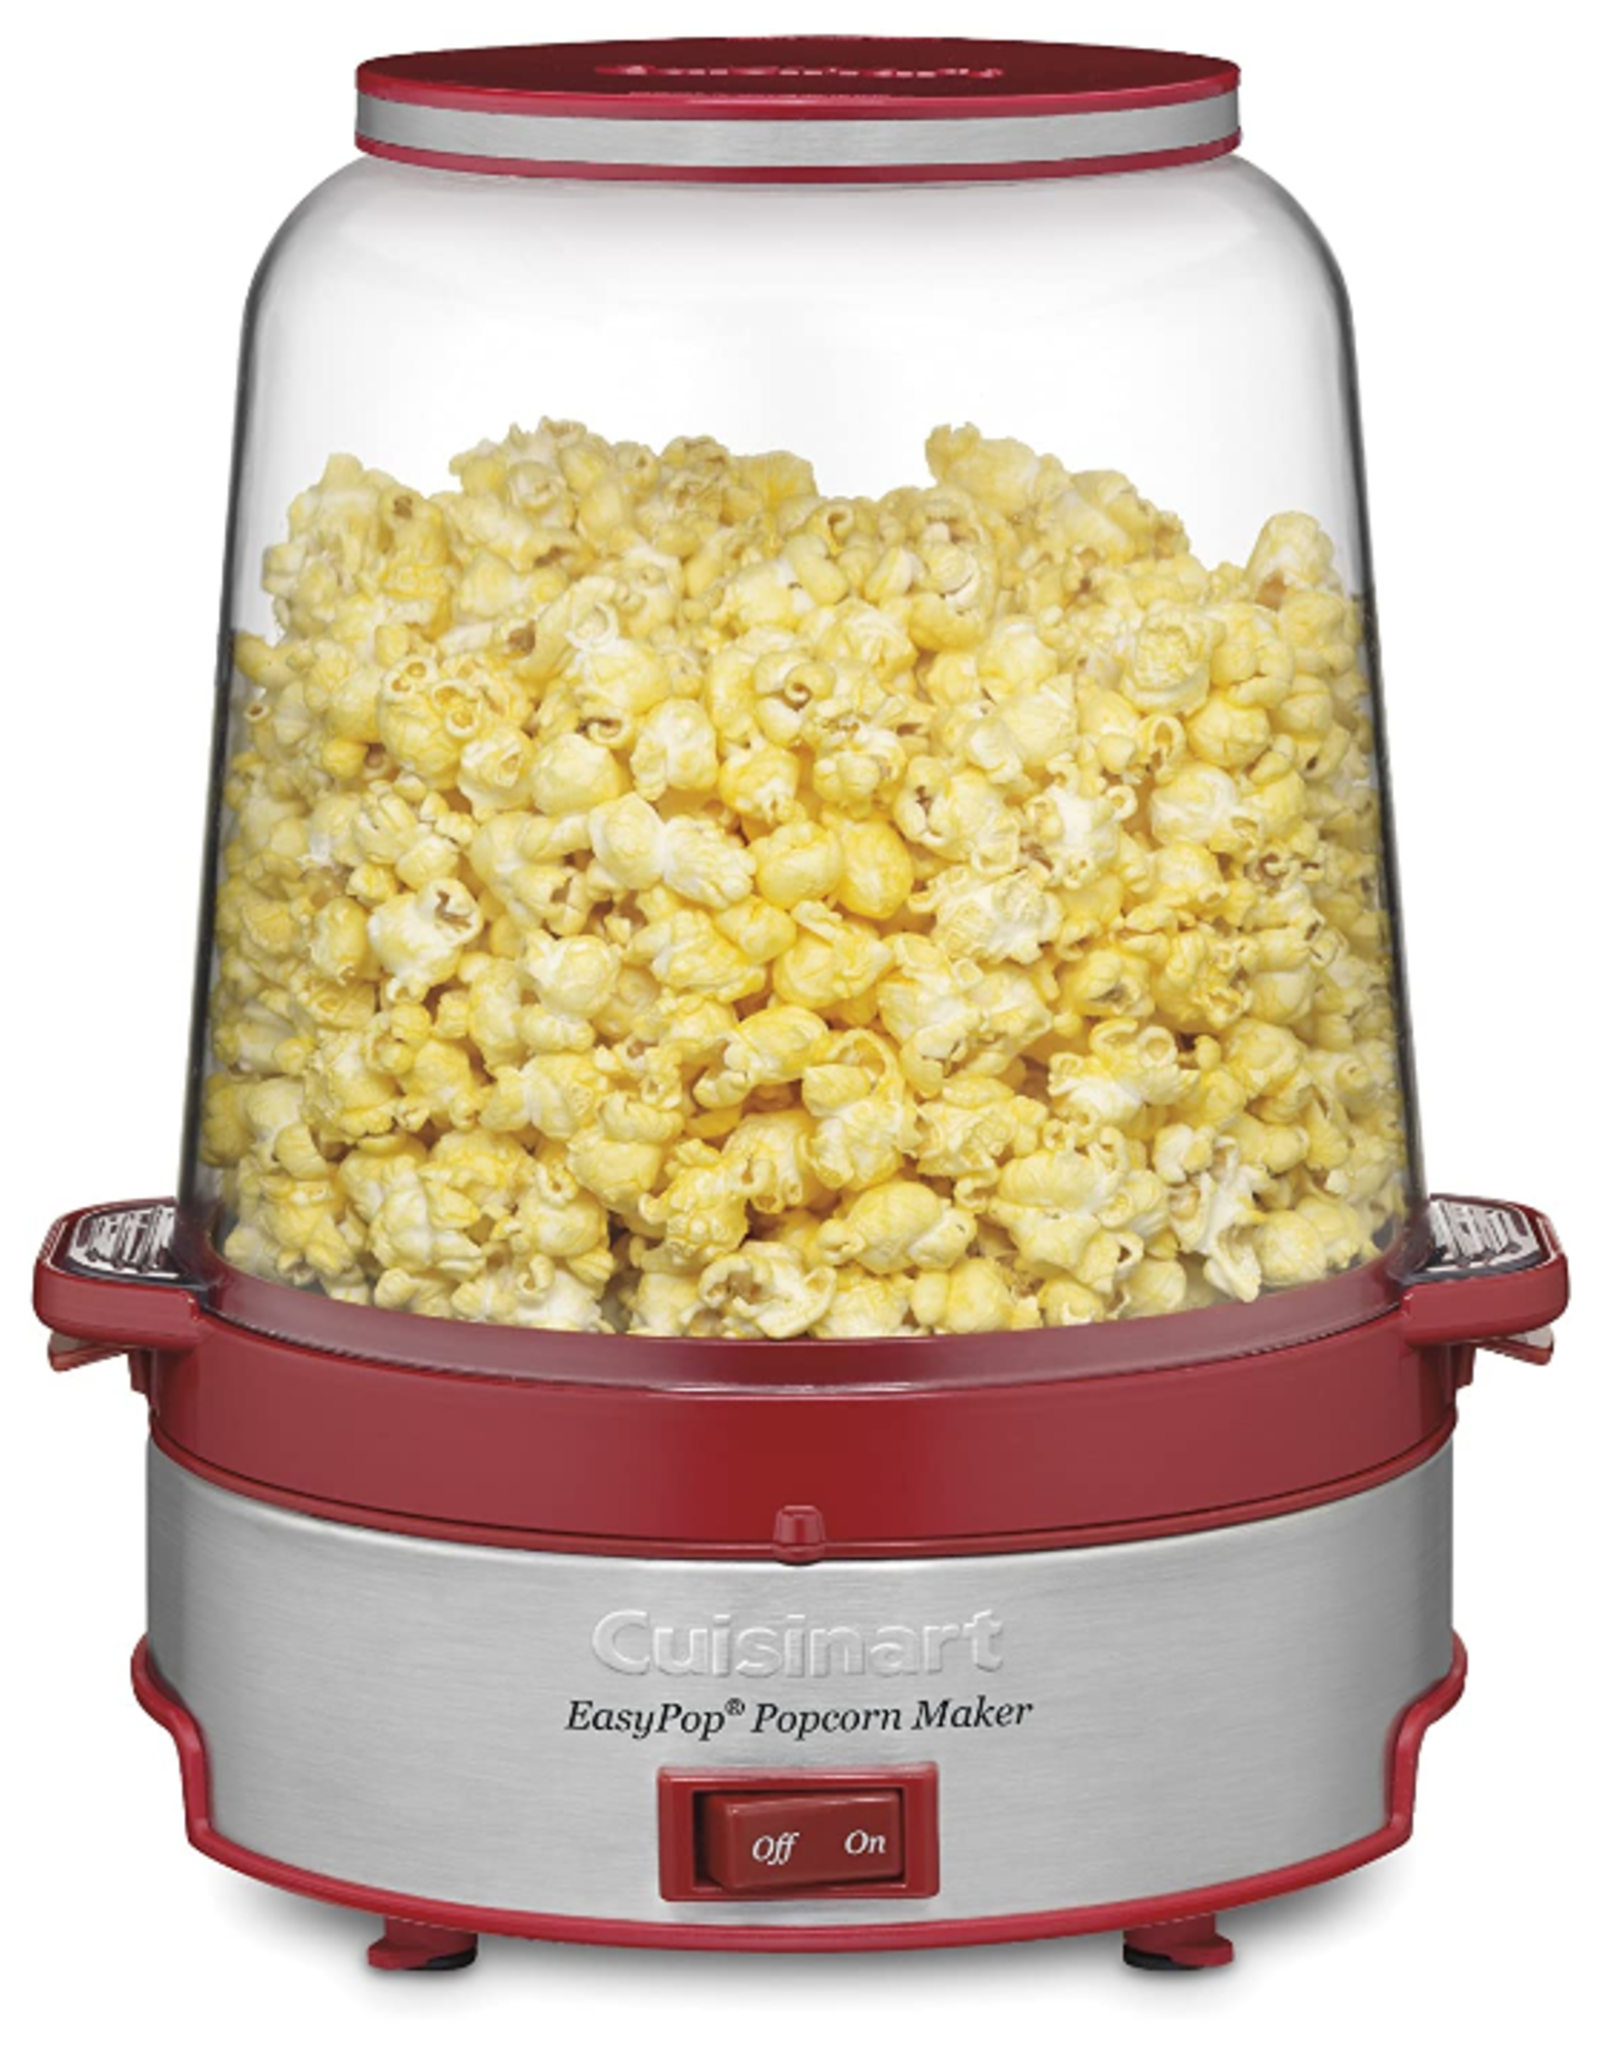 Cuisinart Easy Pop Popcorn Maker